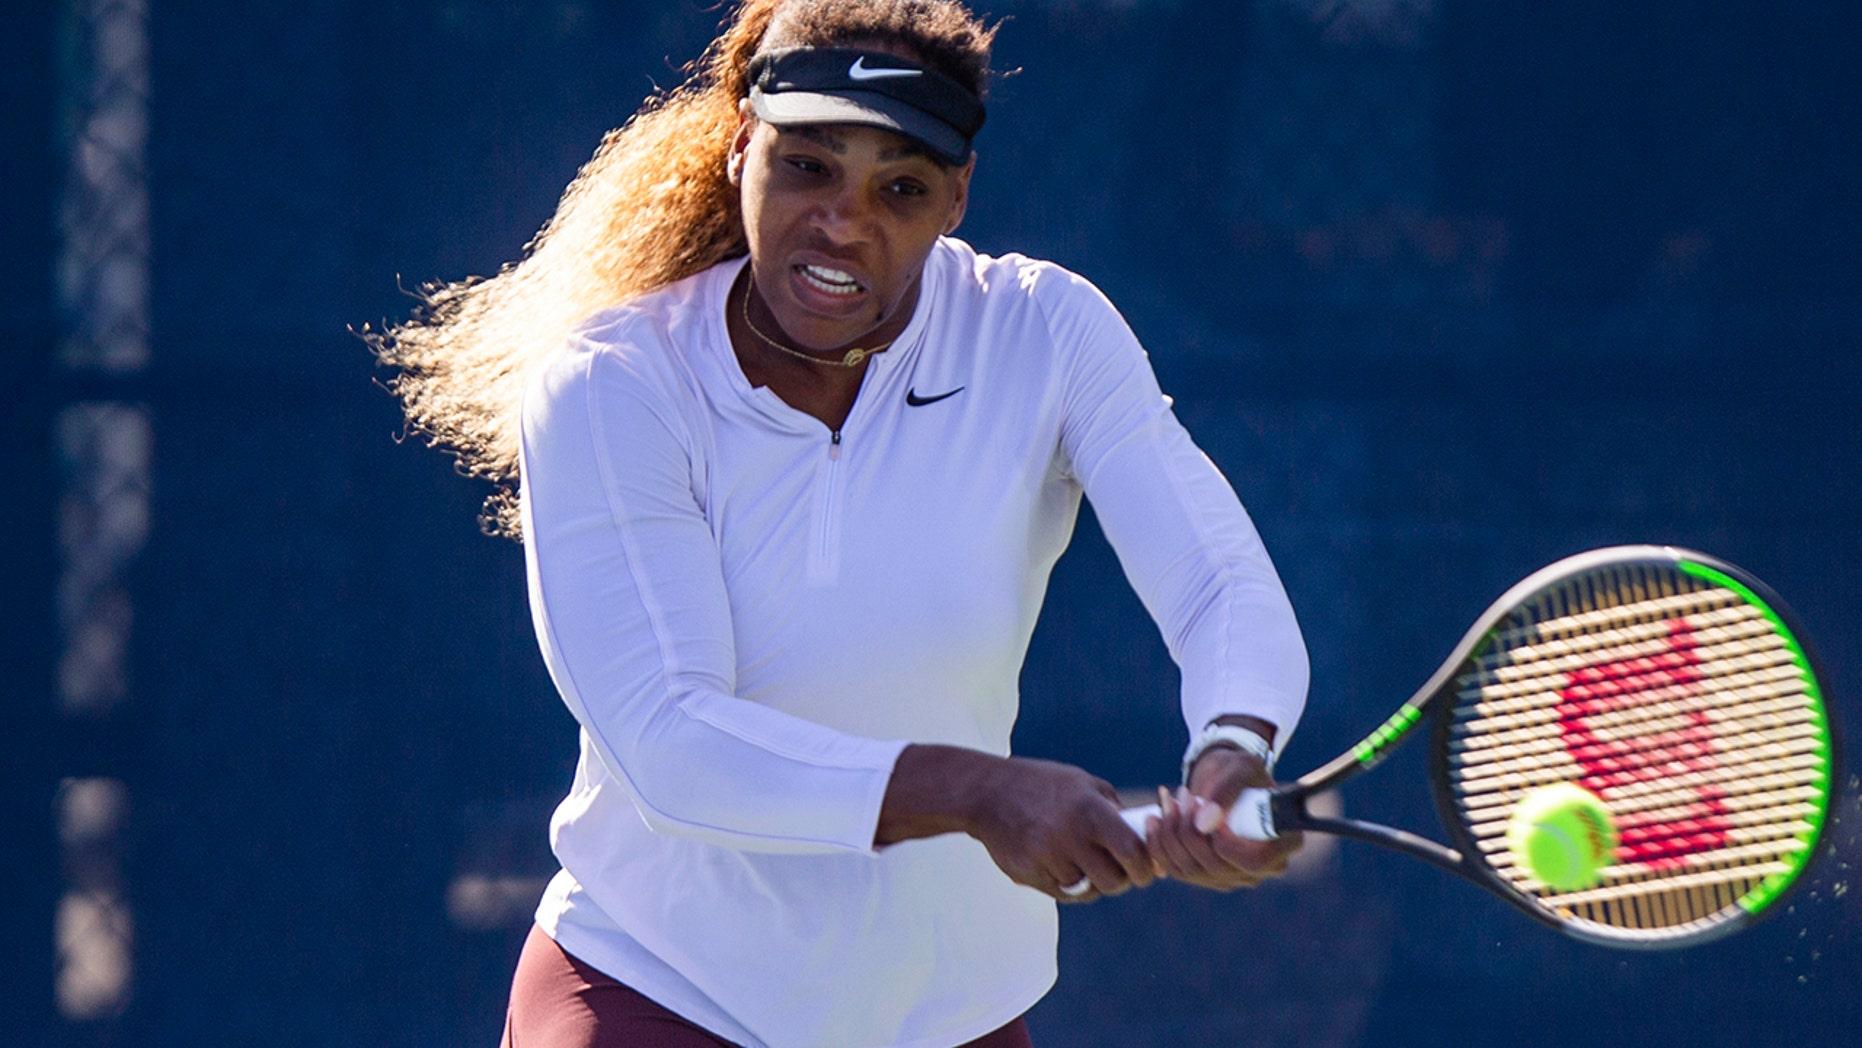 Serena Williams, of the United States, returns the ball as she practices for the U.S. Open tennis tournament Saturday, Aug. 24, 2019, in New York. (AP Photo/Eduardo Munoz Alvarez)